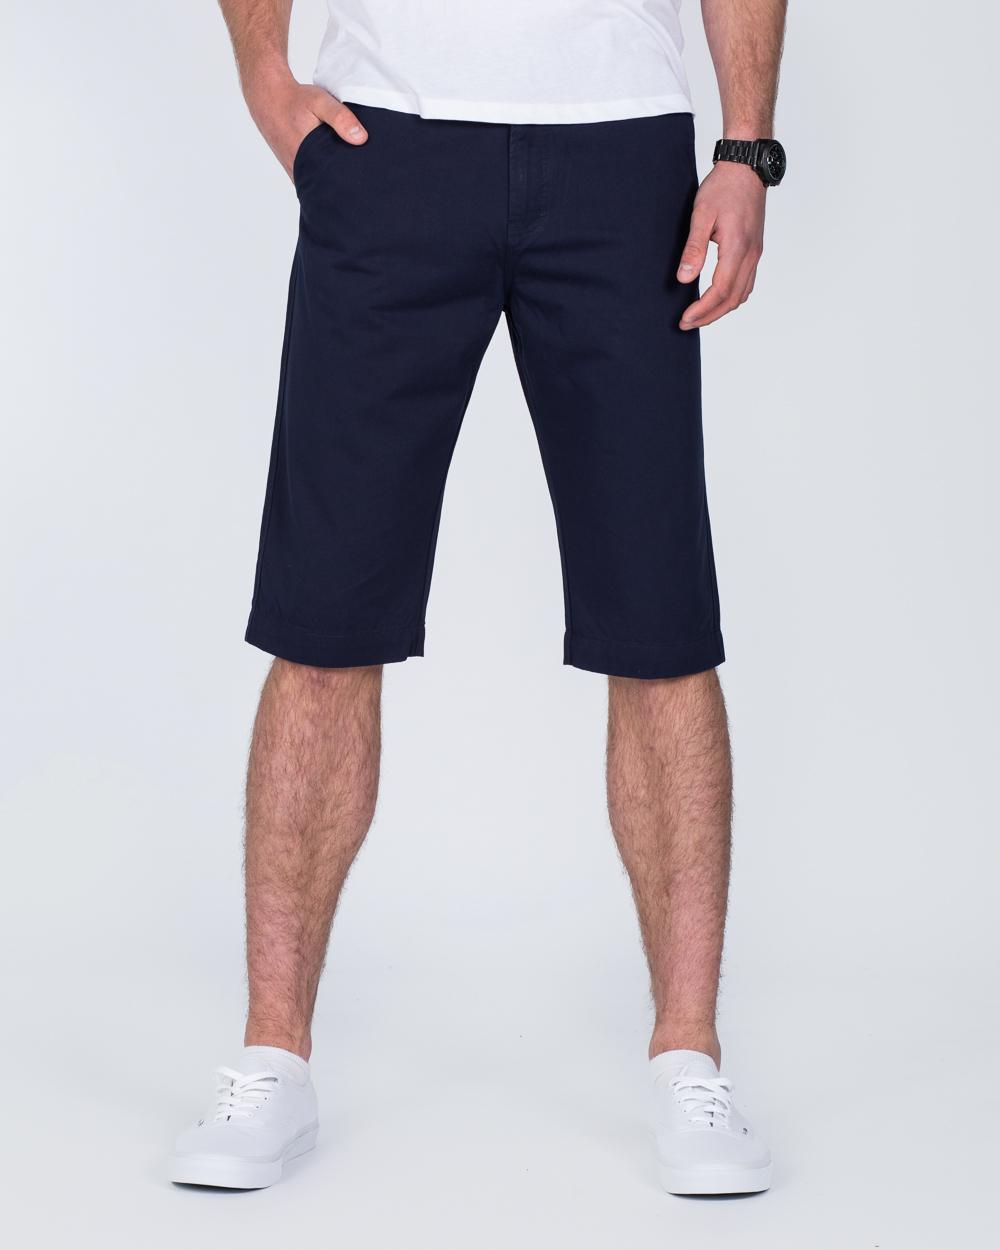 Ed Baxter Marakesh Tall Chino Shorts (navy)